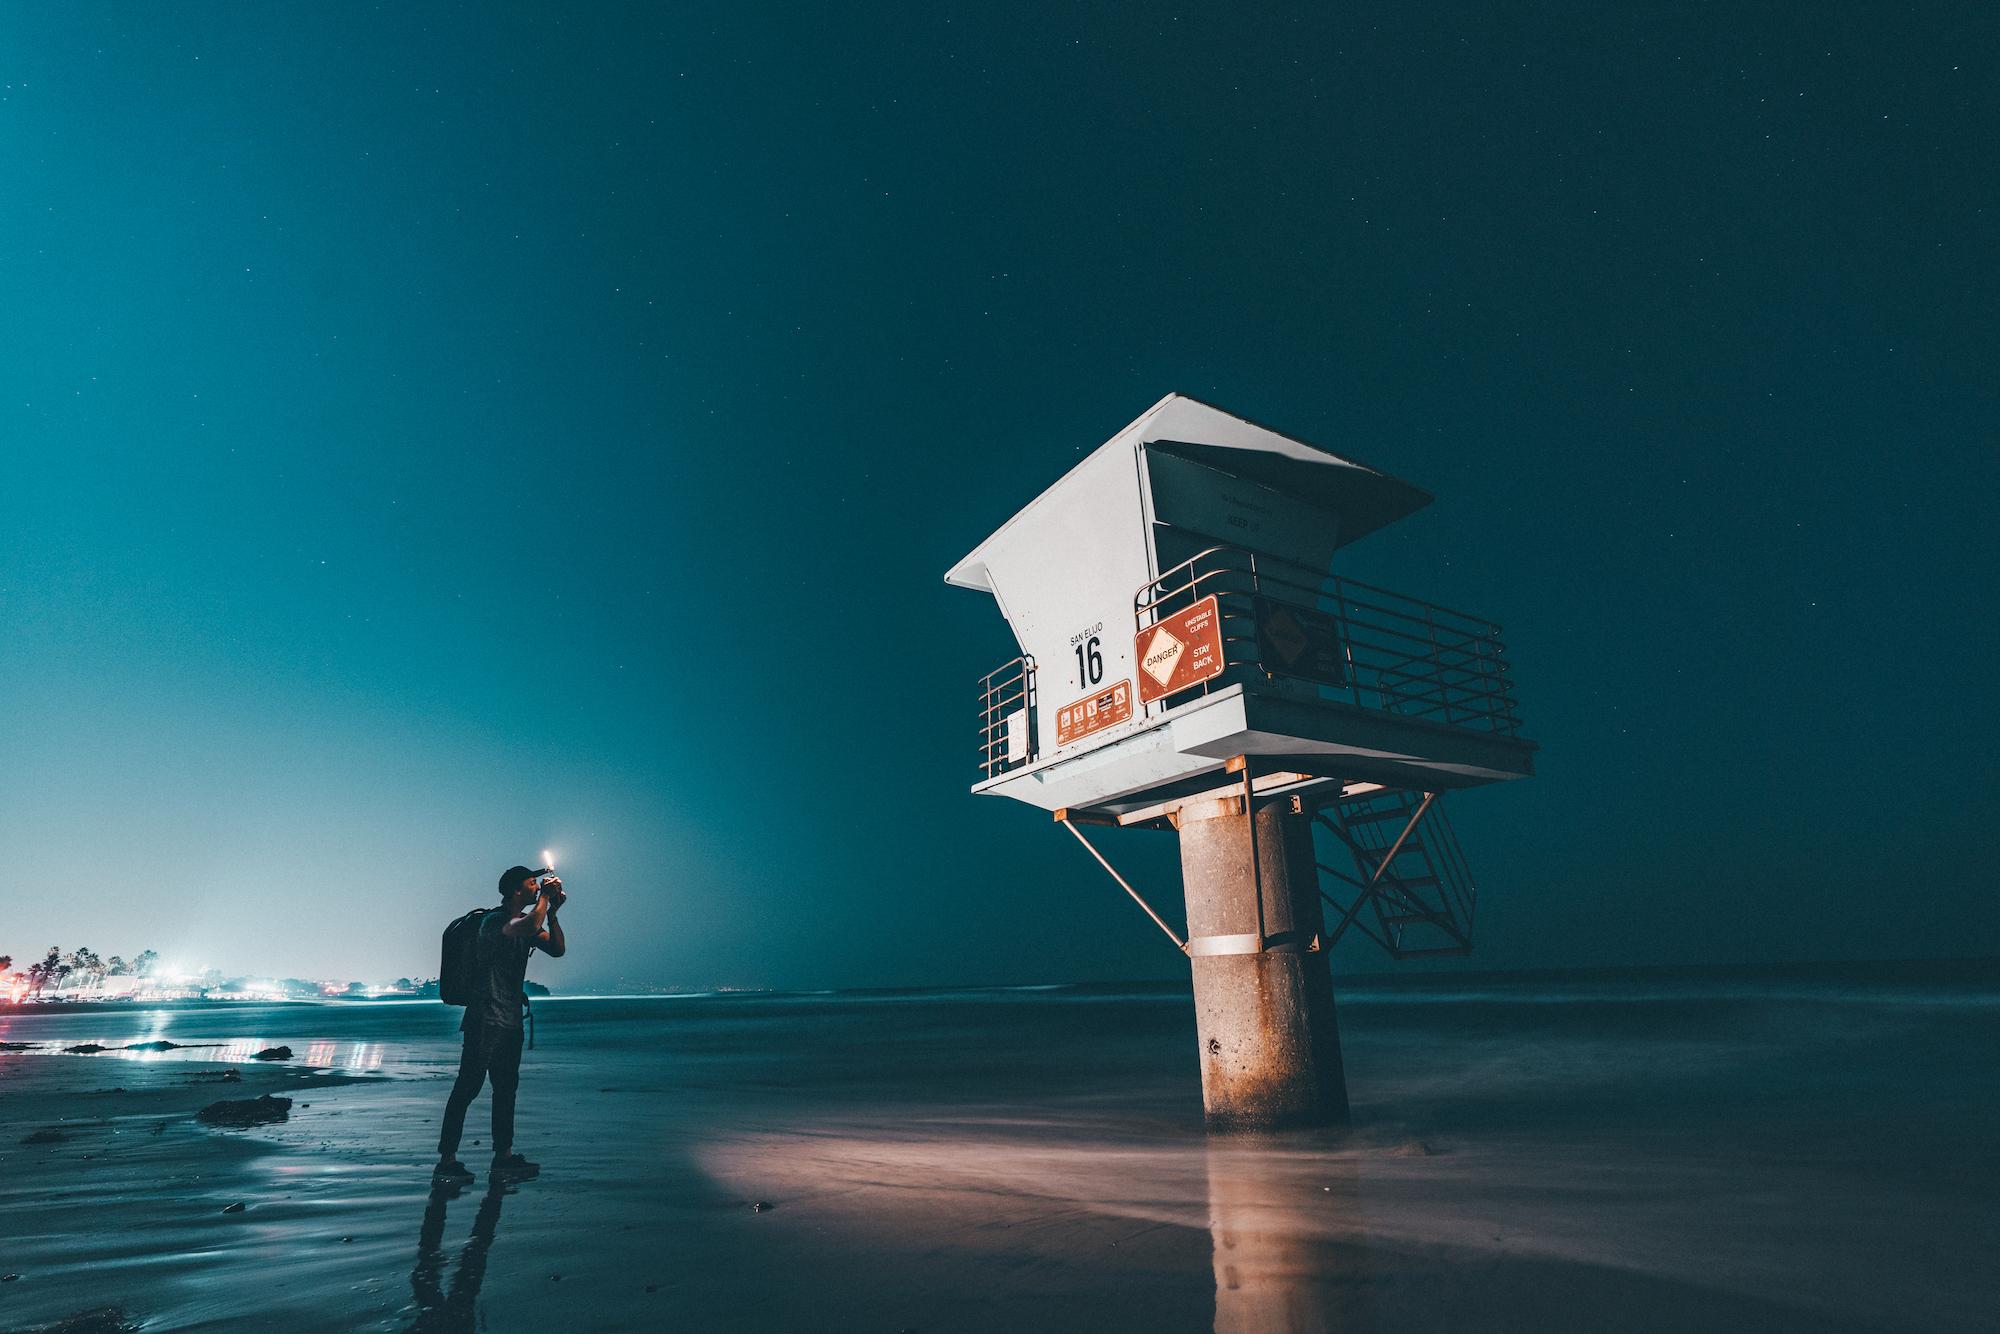 man taking photo at night of lifeguard tower at beach using panel pro